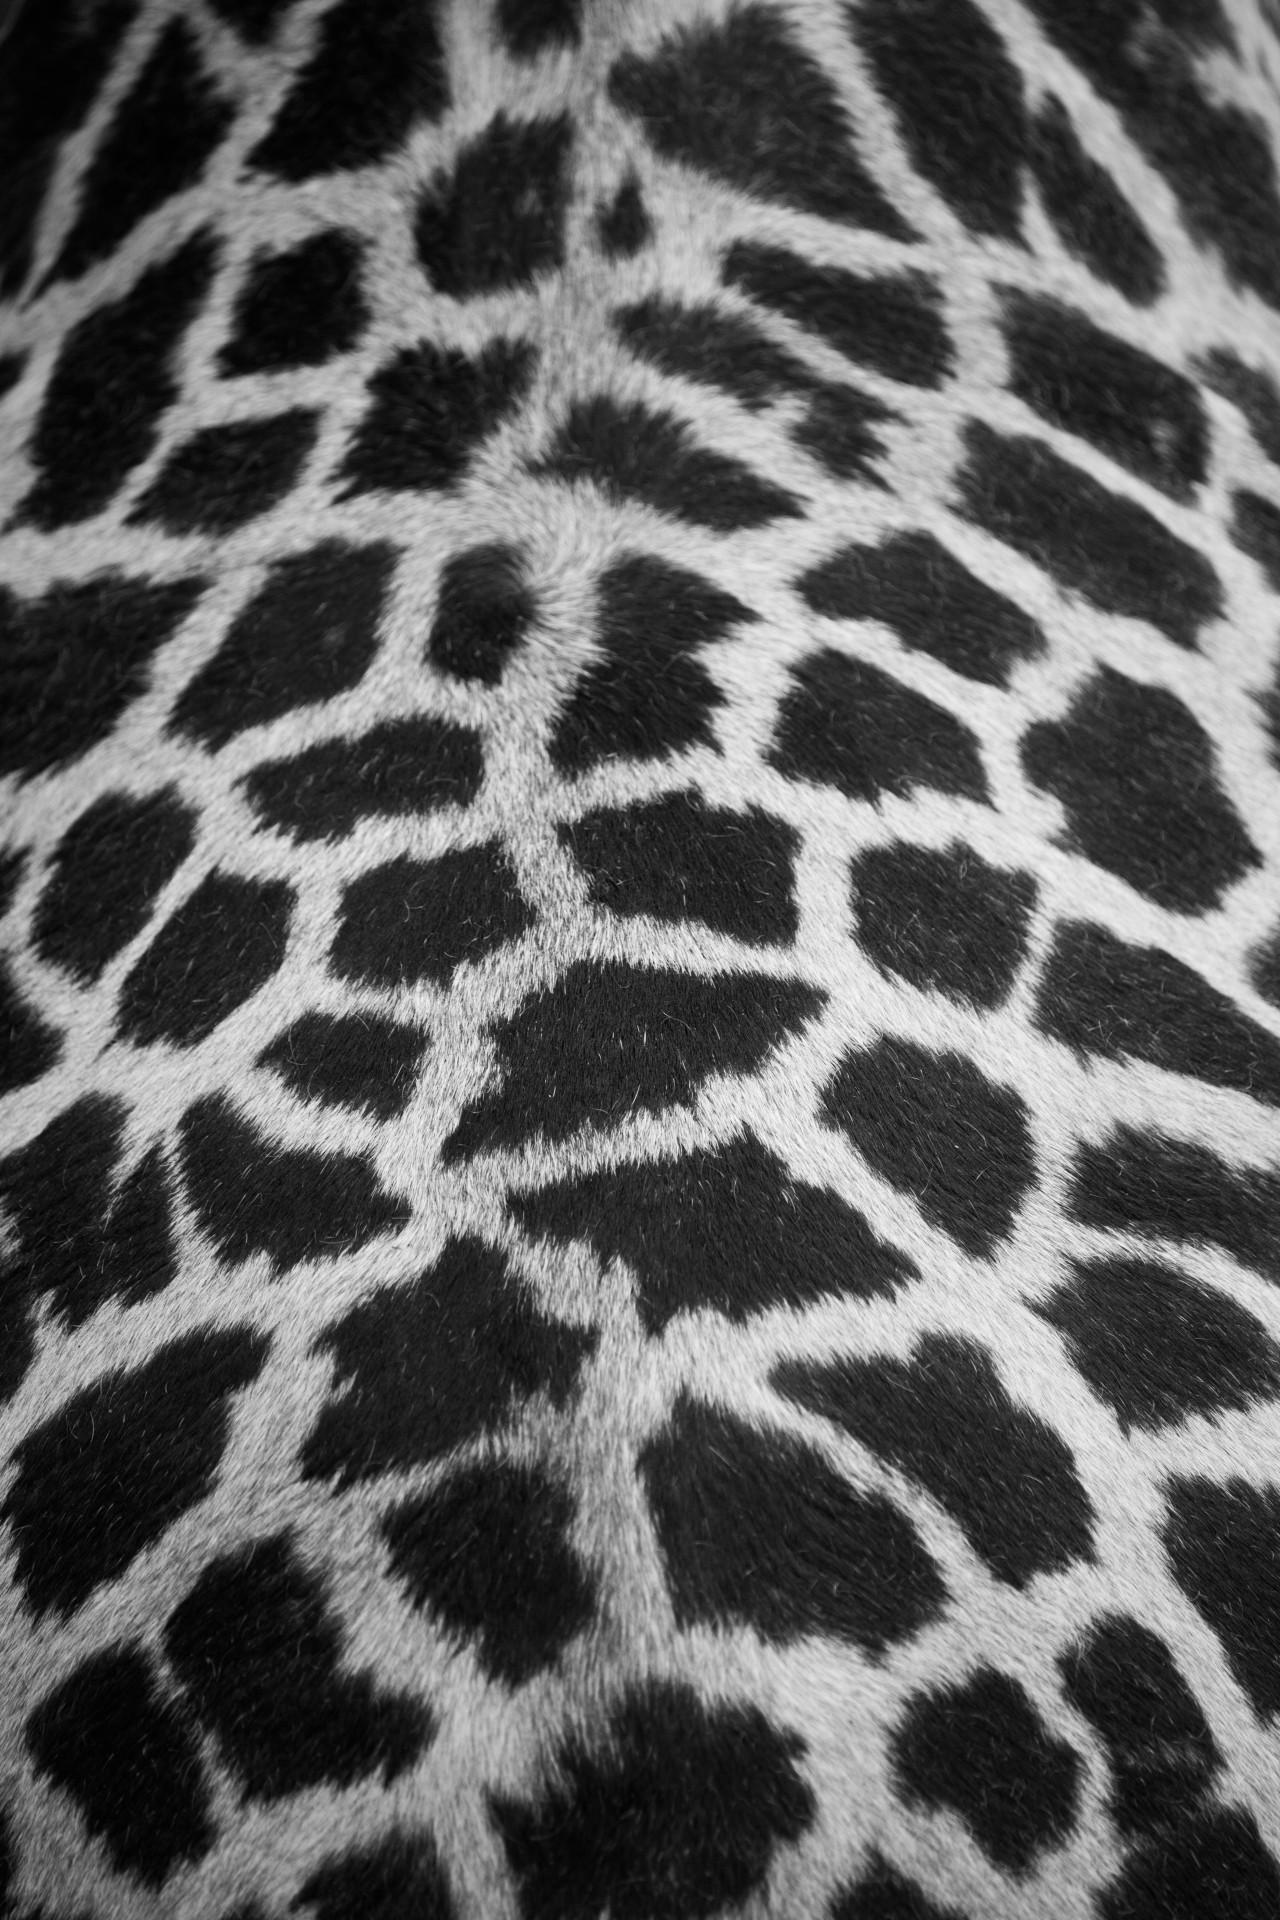 content/images/img-19-20/programme/chapitre-3/giraffe-skin-pattern-14425725159QM.jpg